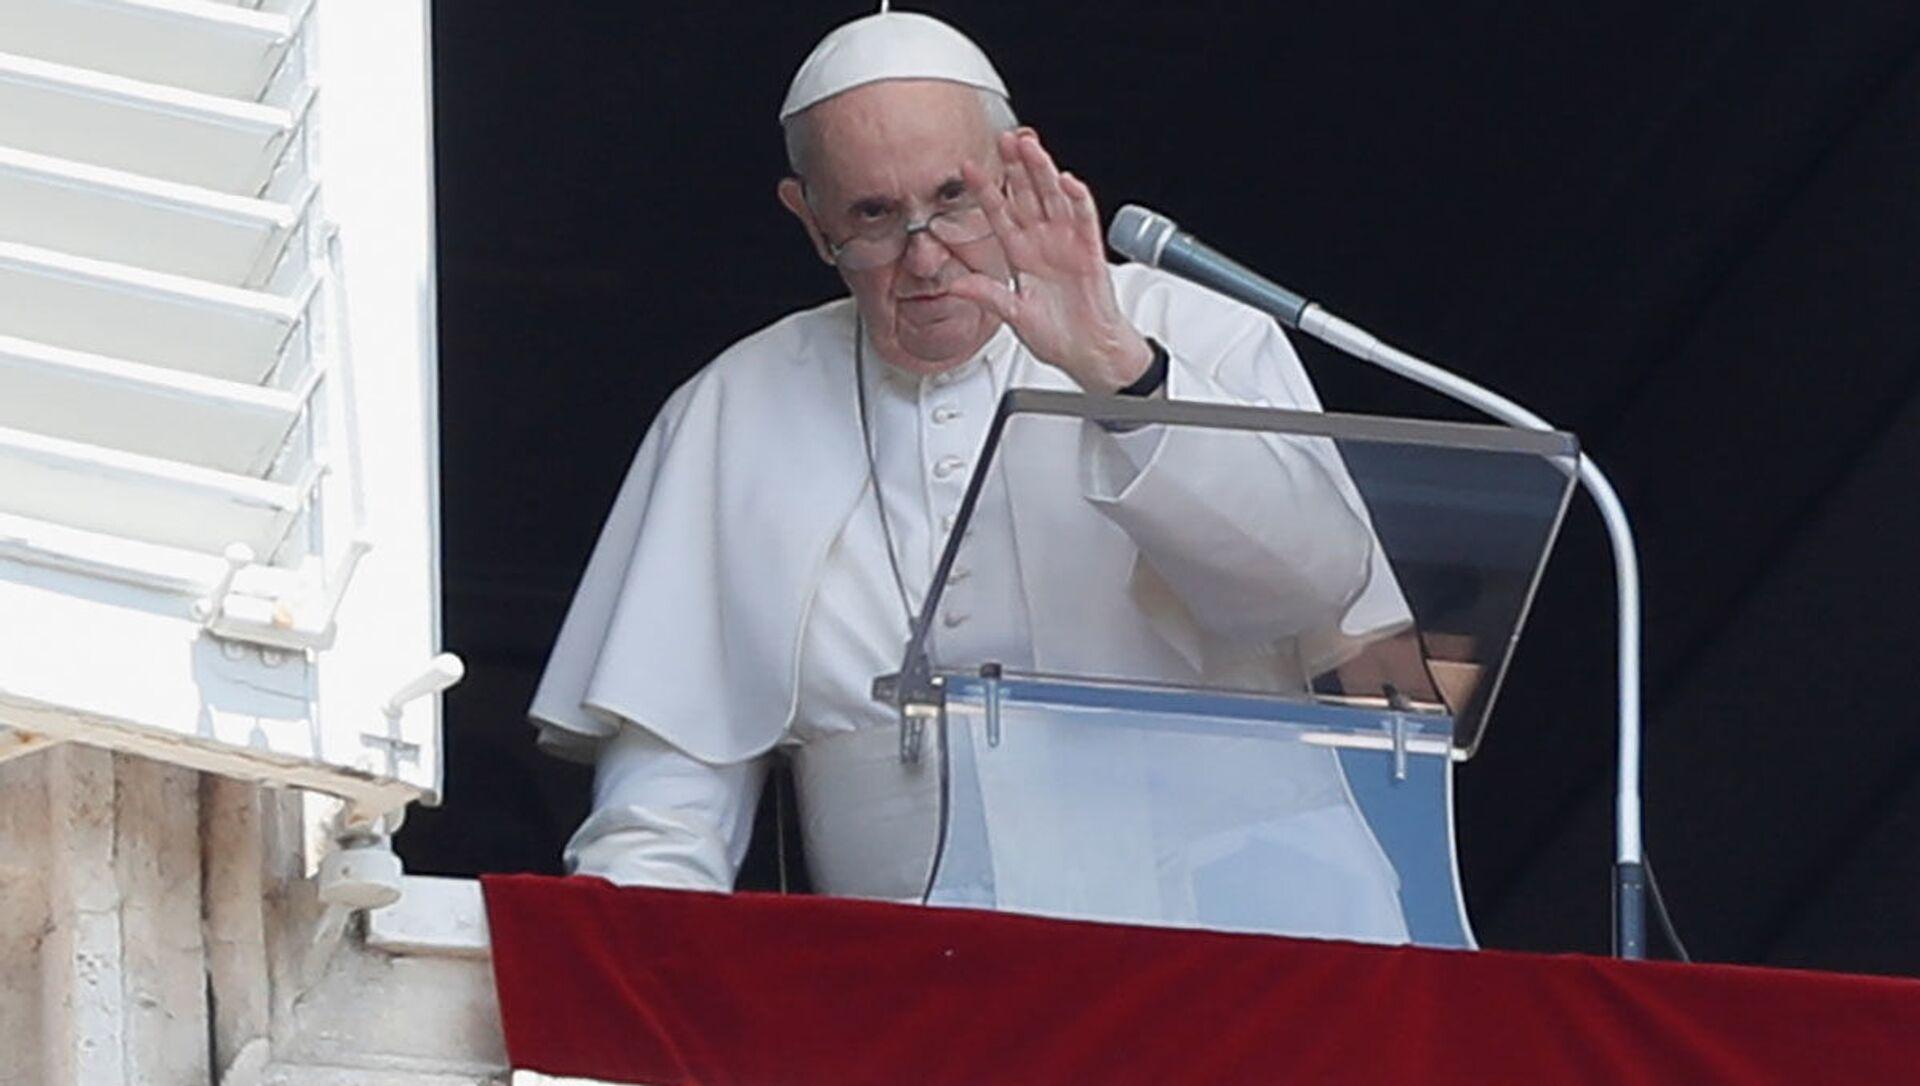 Папа Римский Франциск во время проповеди из окна Апостольского дворца Ватикана - Sputnik 日本, 1920, 06.10.2021